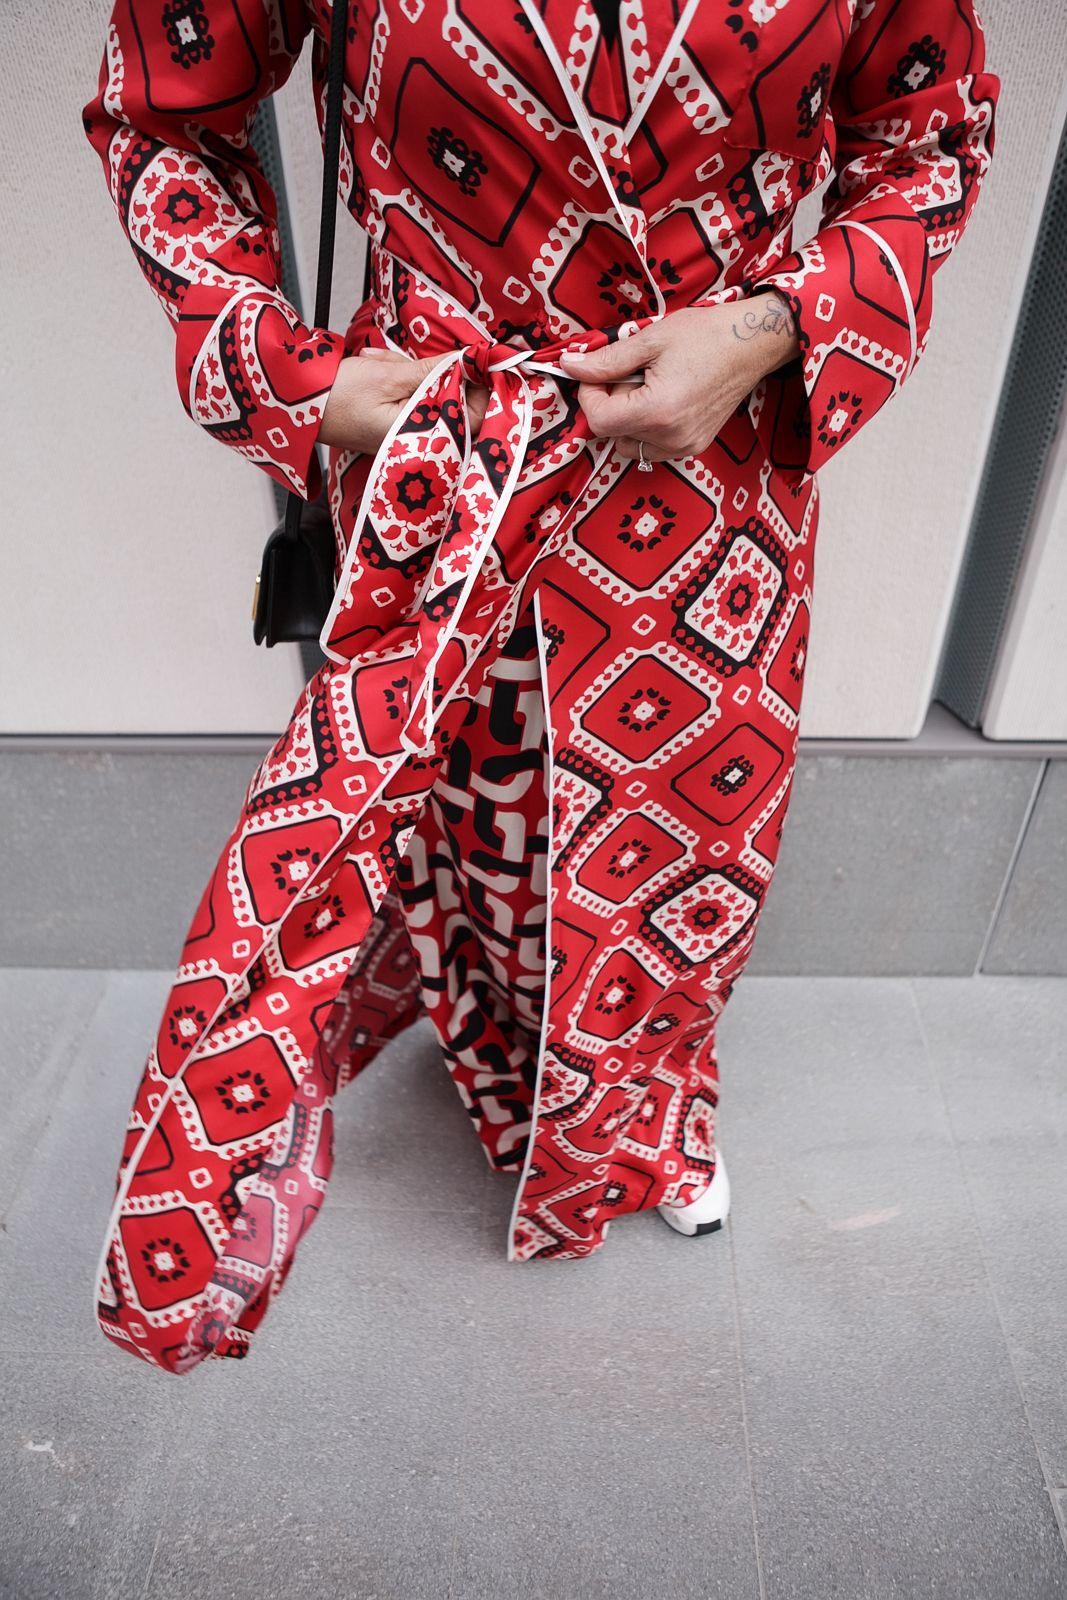 do you like my robe